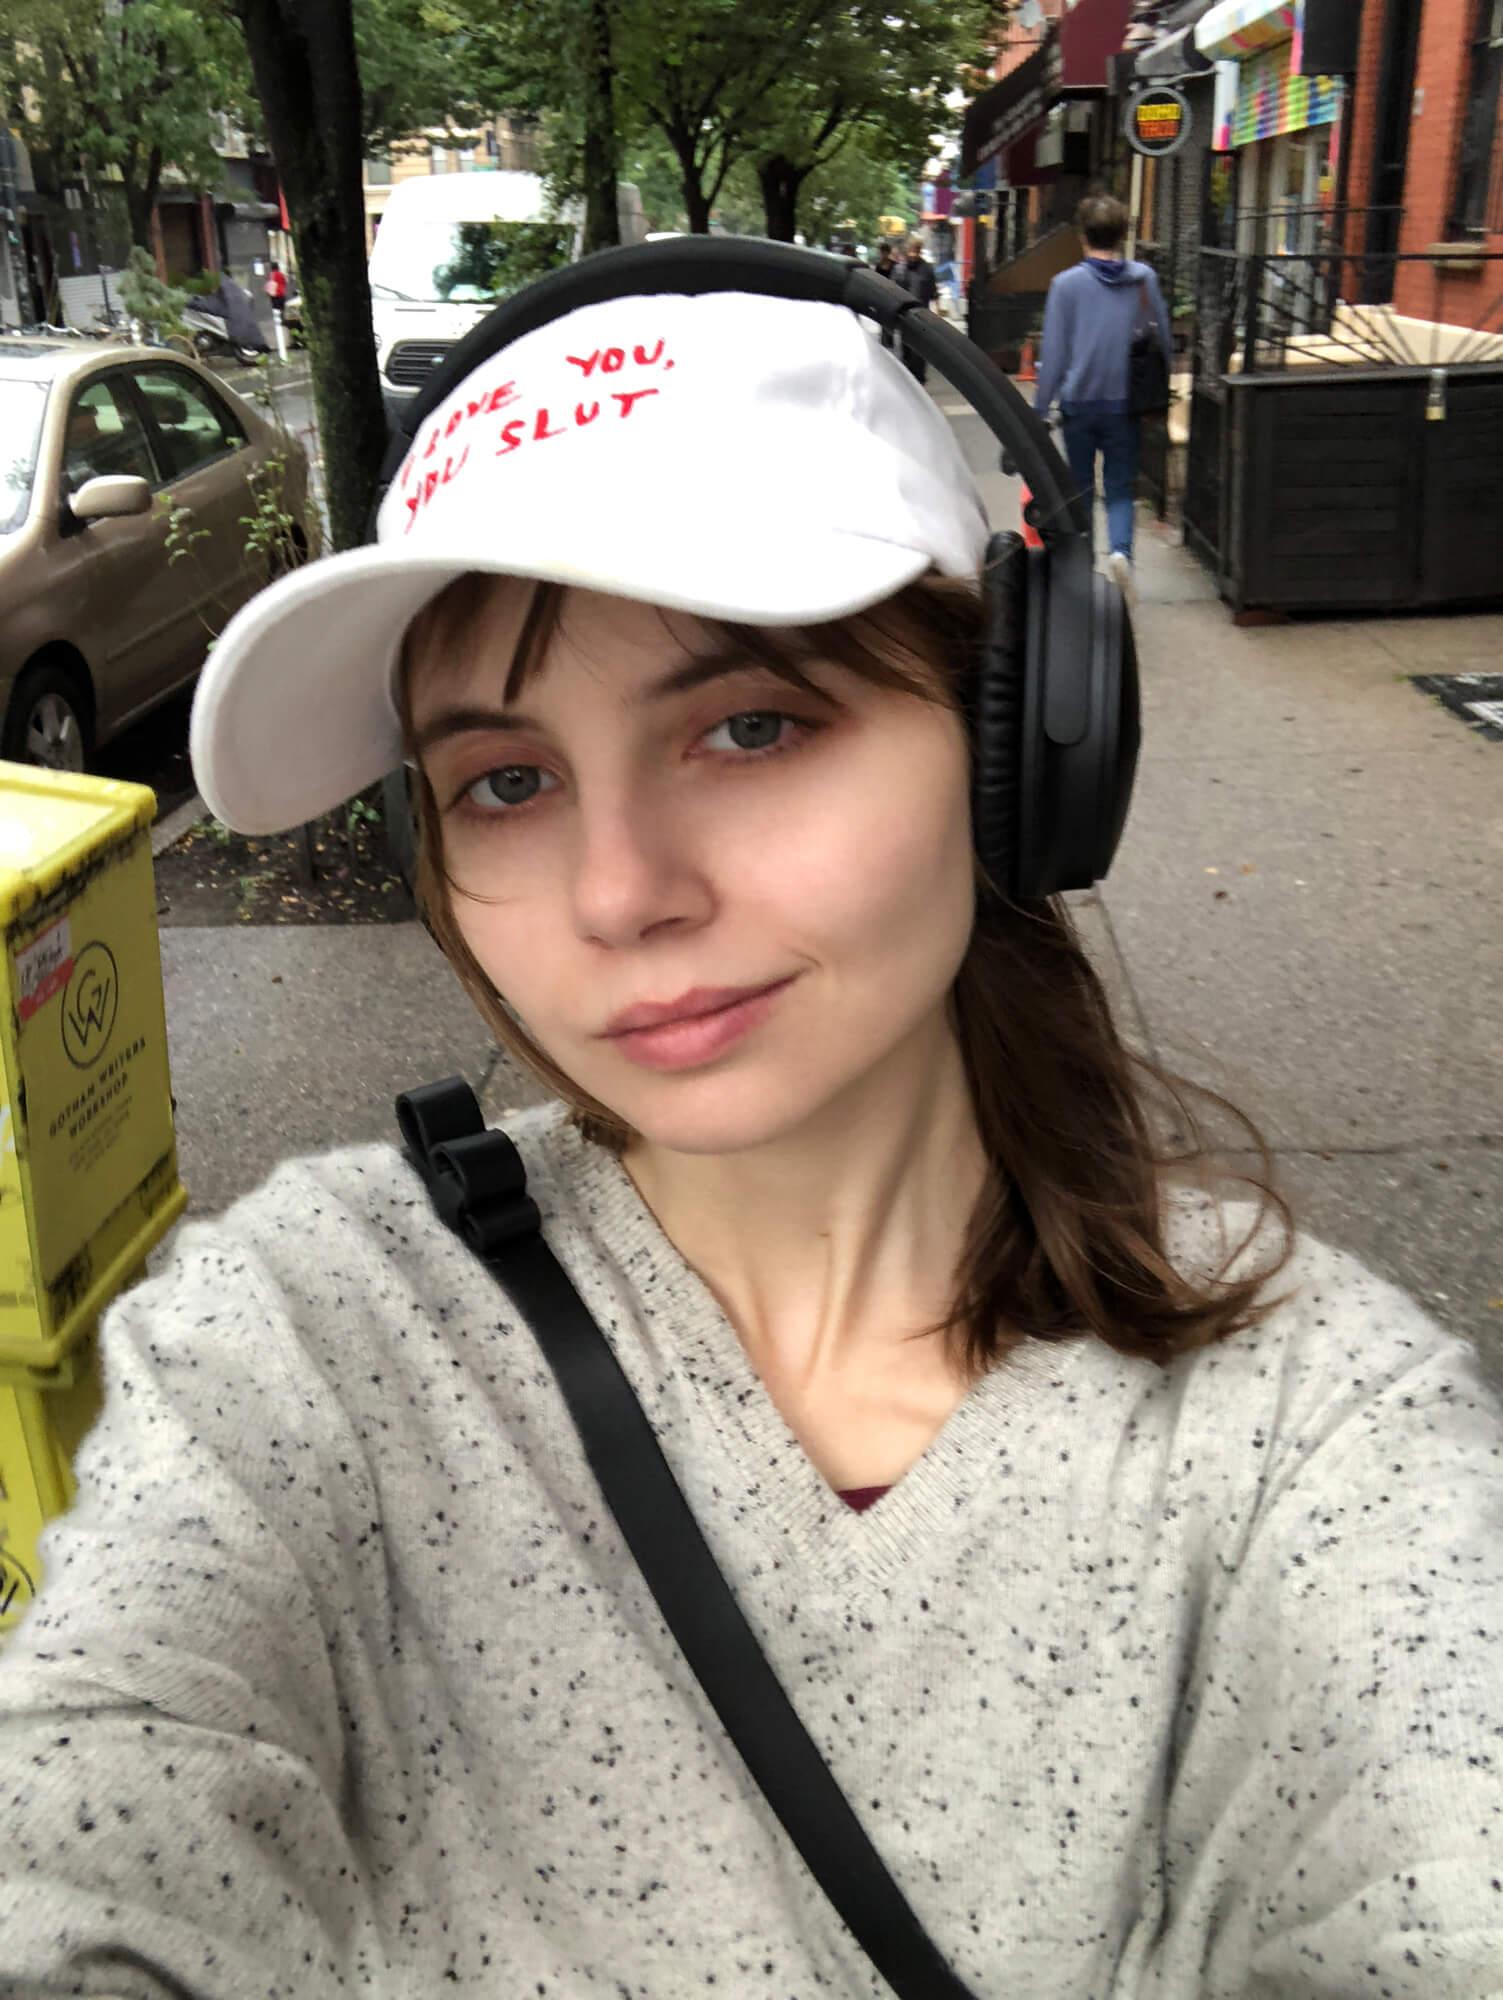 https://liararoux.xxx/wp-content/uploads/2018/10/Liara-Roux-Selfies-and-Snapshots-September-2018-037.jpg